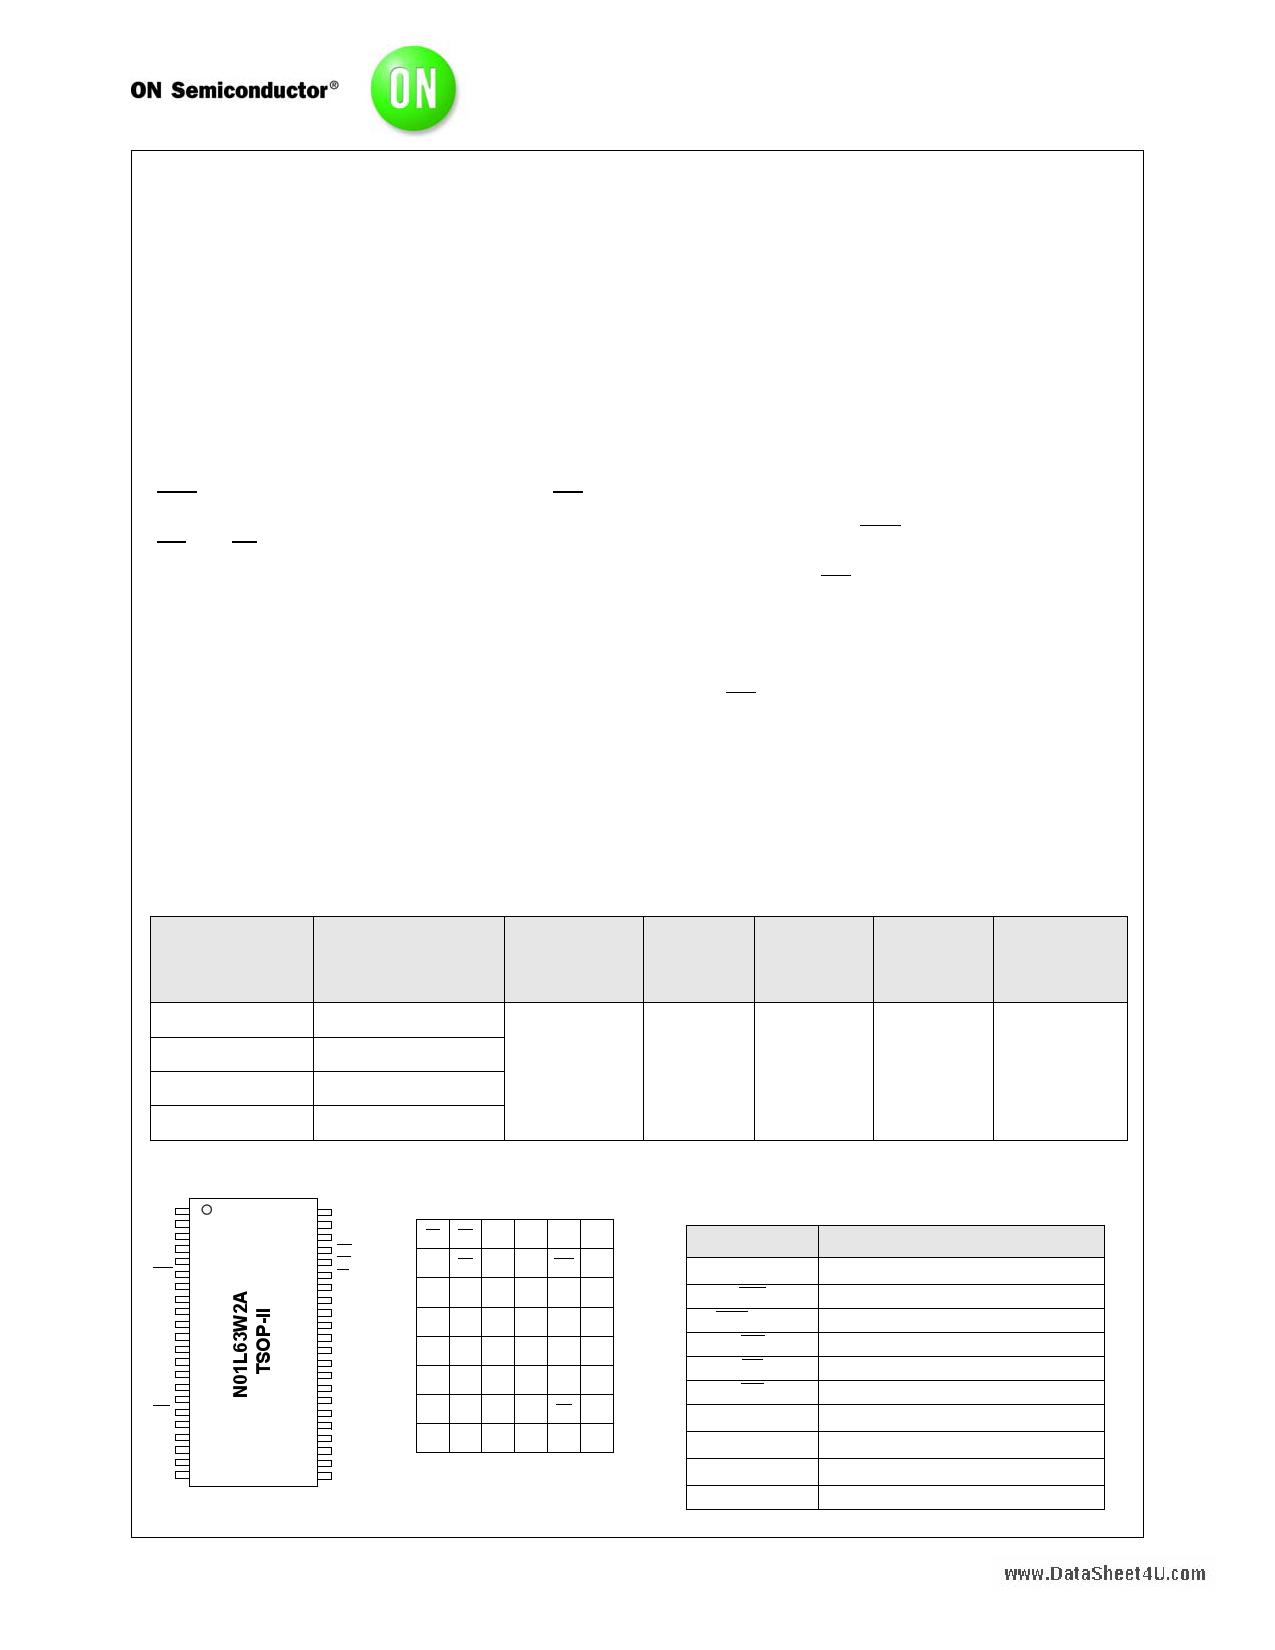 N01L63W2A datasheet